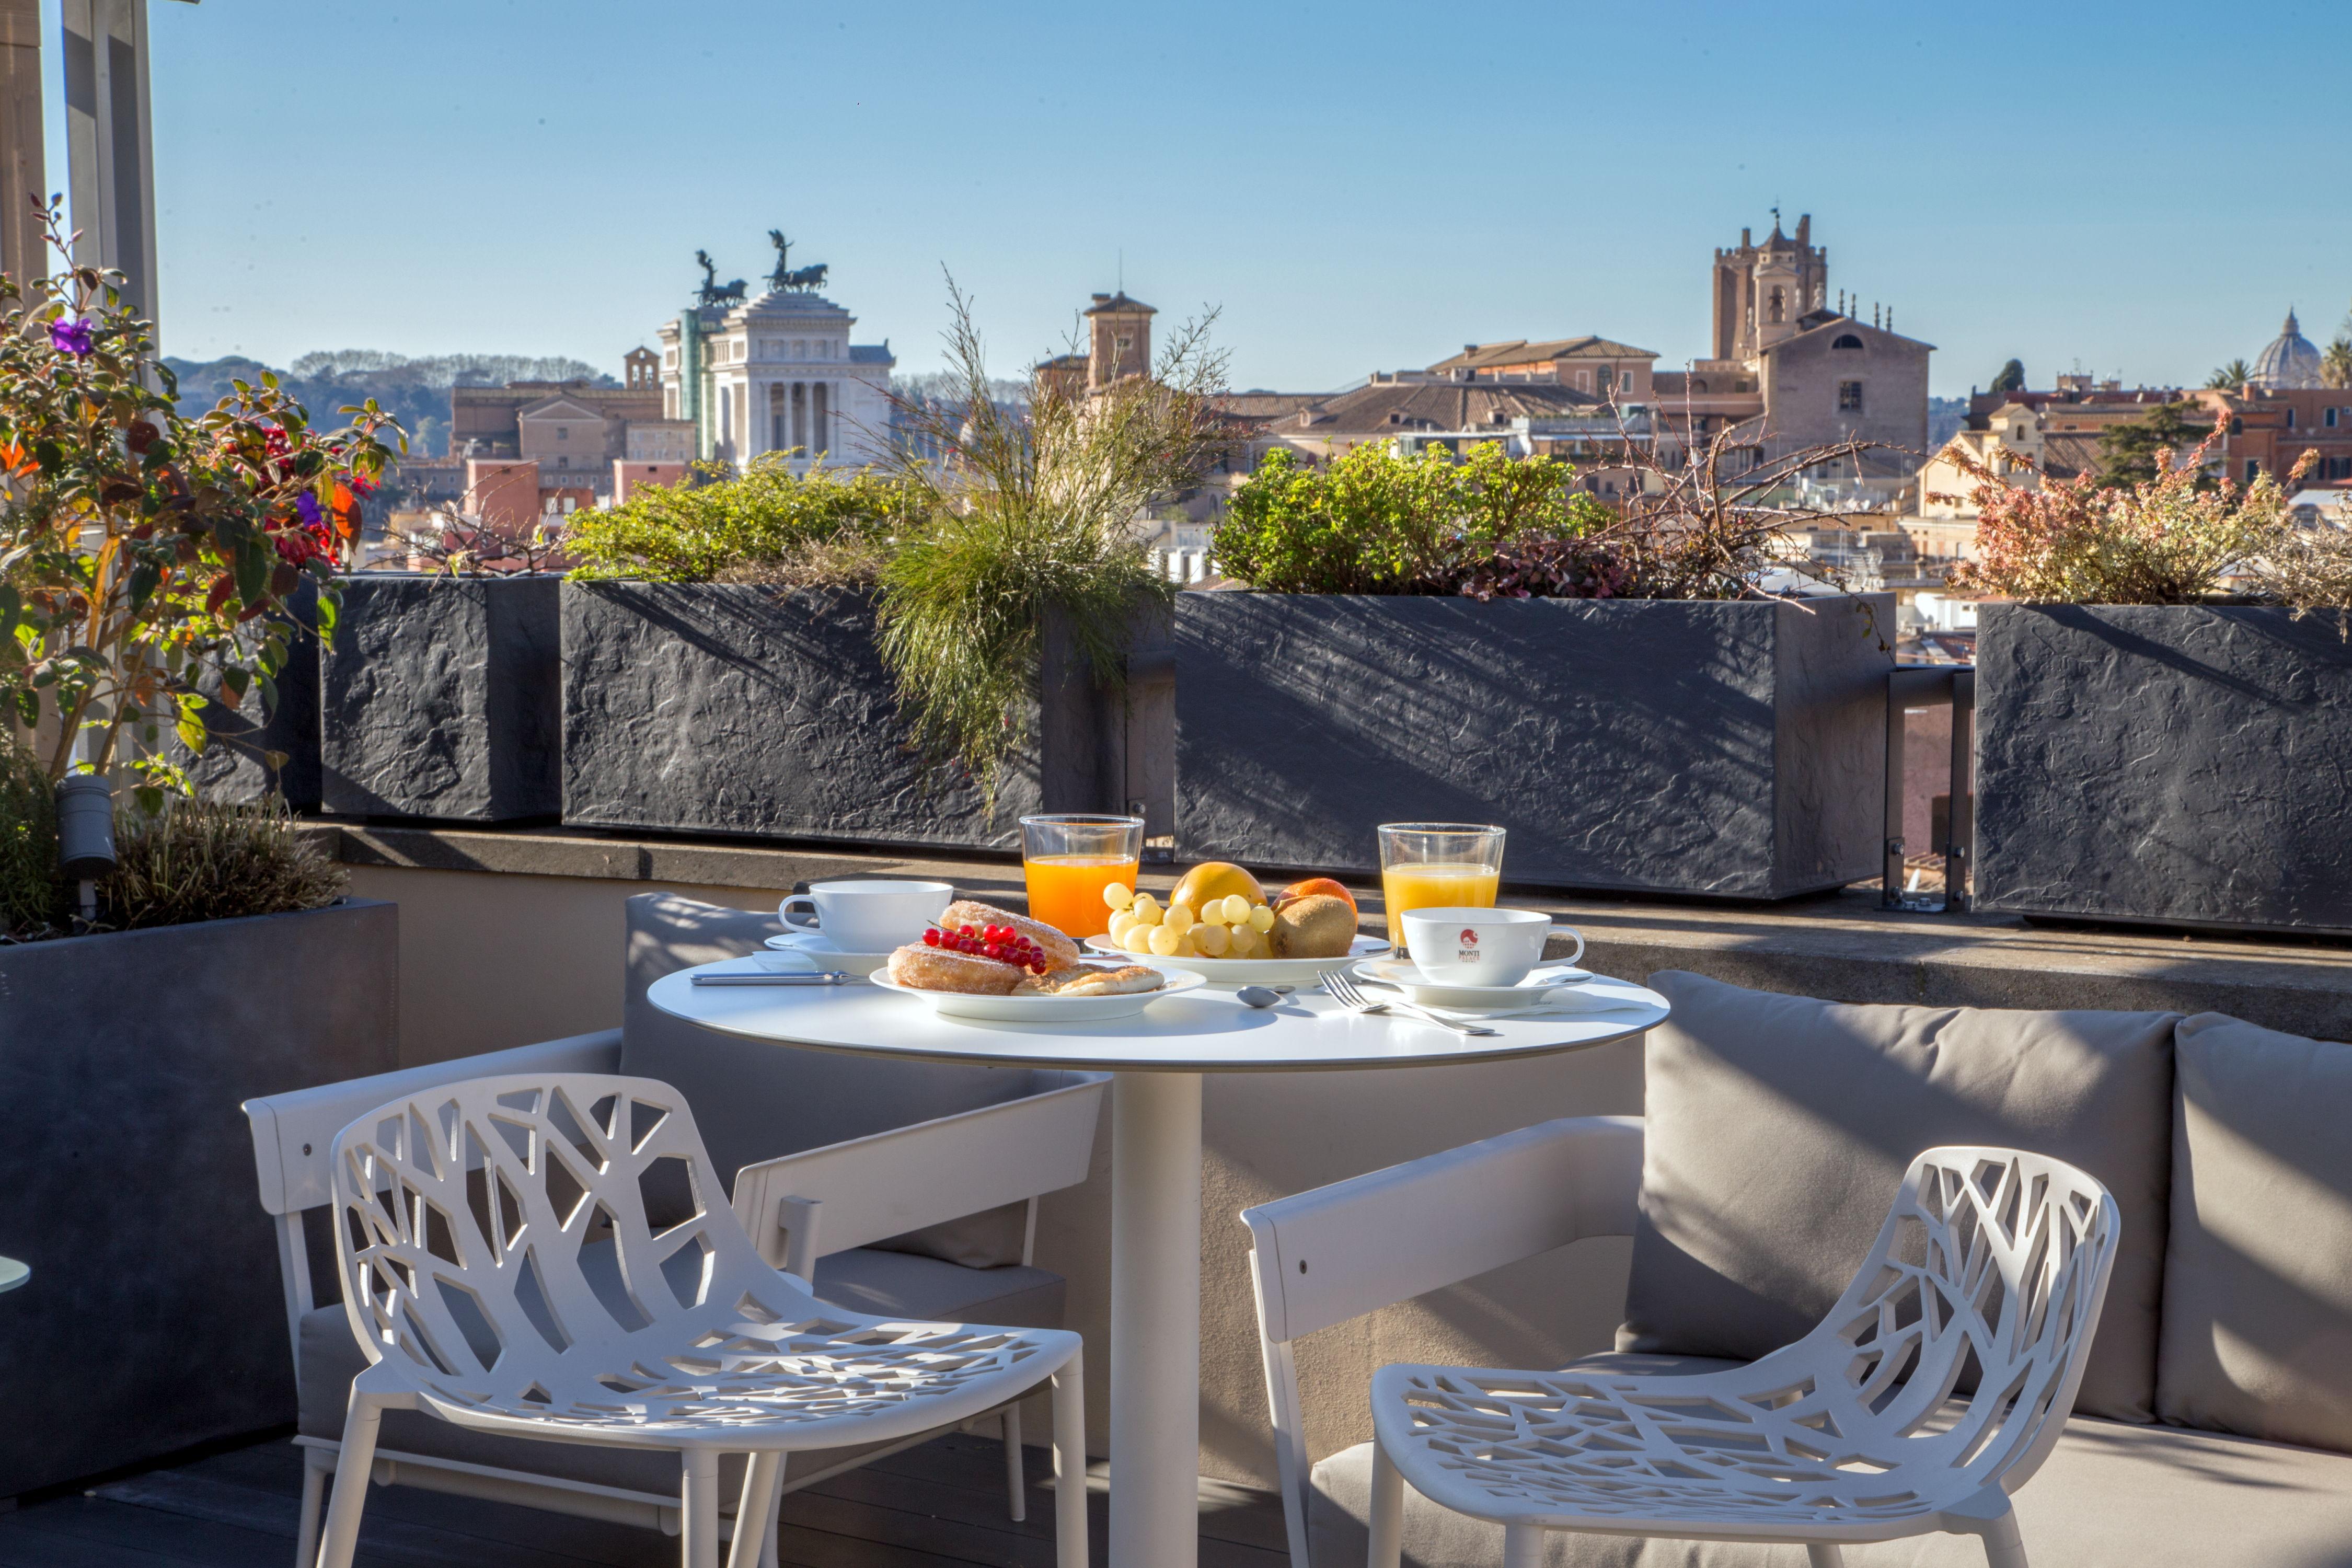 Muebles: Fast. Localidad: Hotel Monti Palace, Roma, Italia. Foto suministrada